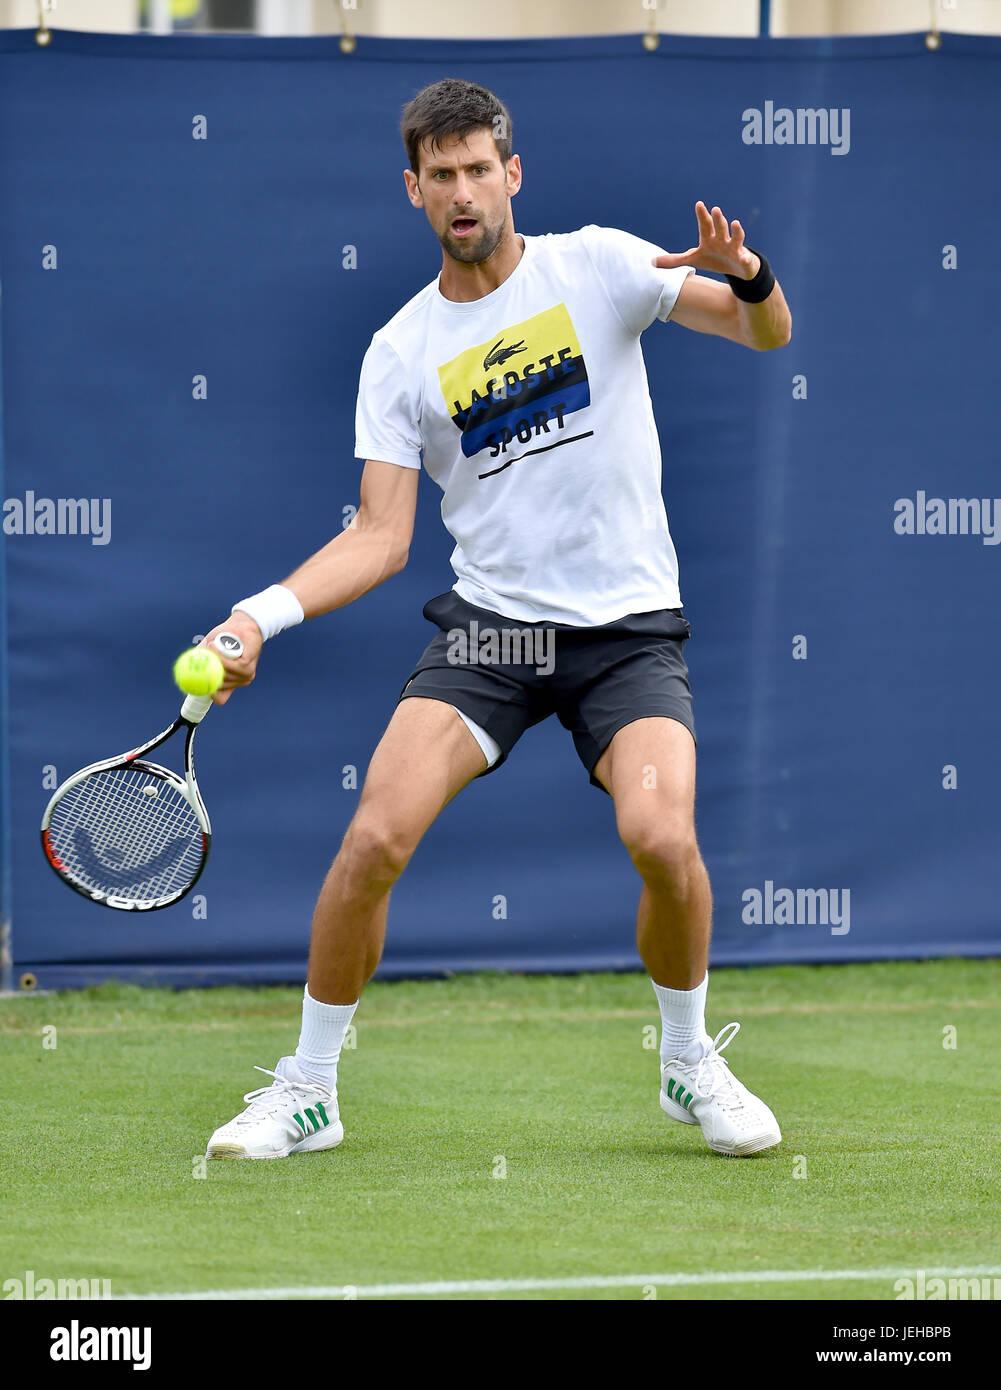 Novac Djokovic practicar en el Aegon International Tennis Tournament en Devonshire Park en Eastbourne East Sussex, Reino Unido. 25 Jun 2017 Foto de stock